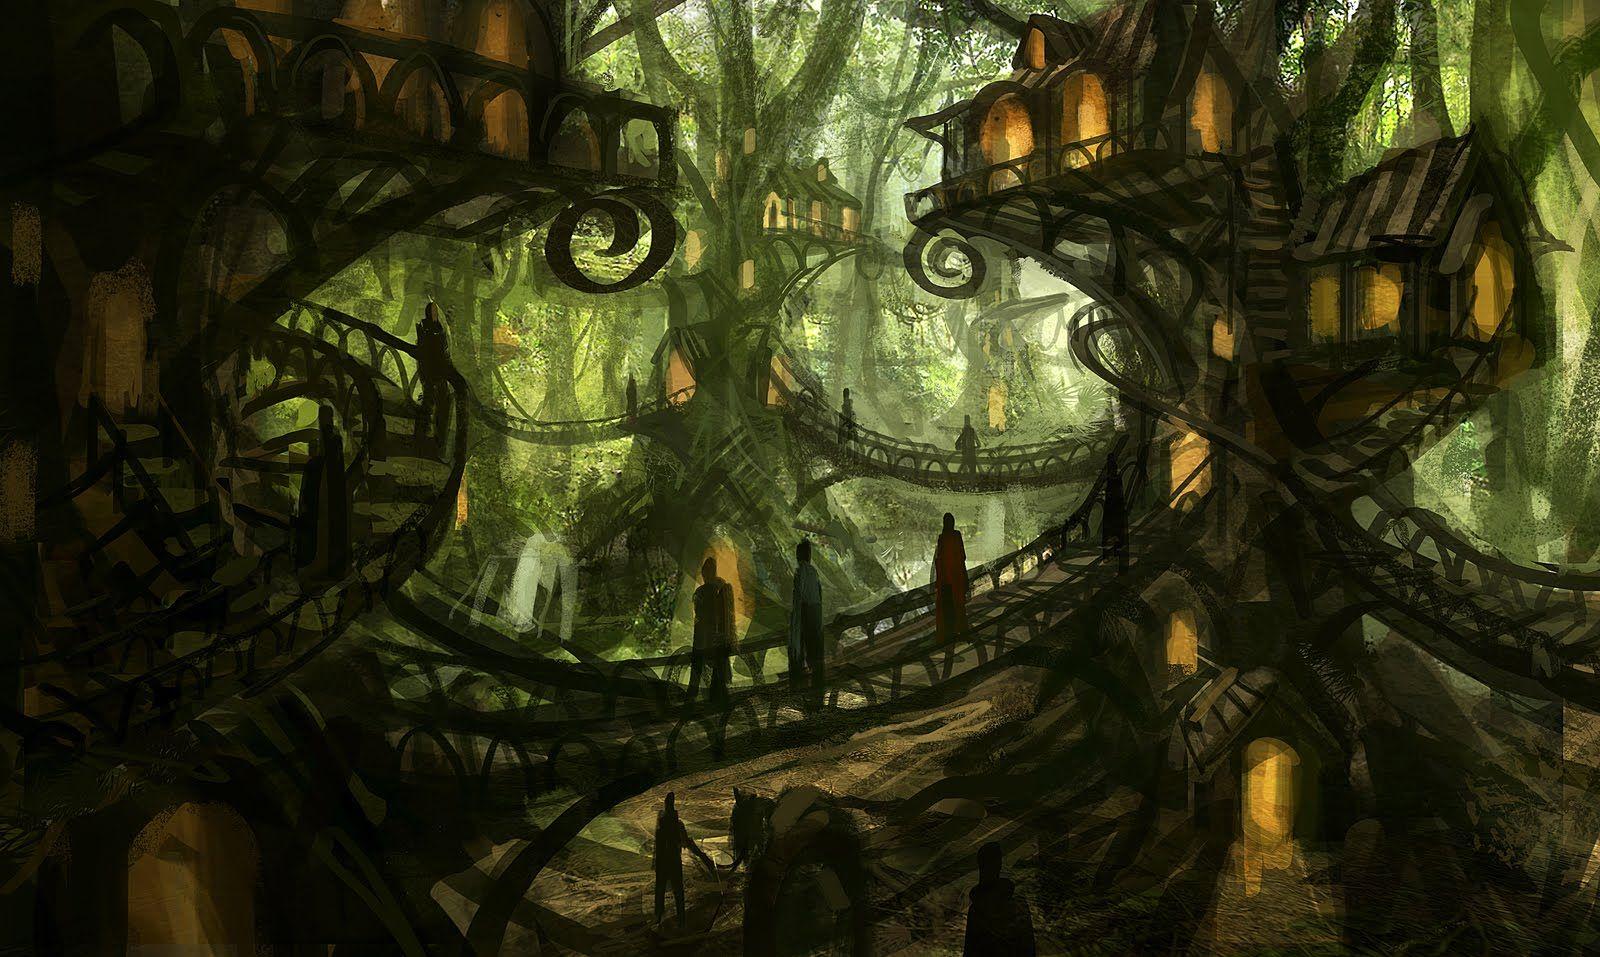 Fukurokuju Village Fantasy Tree Fantasy Concept Art Fantasy Village